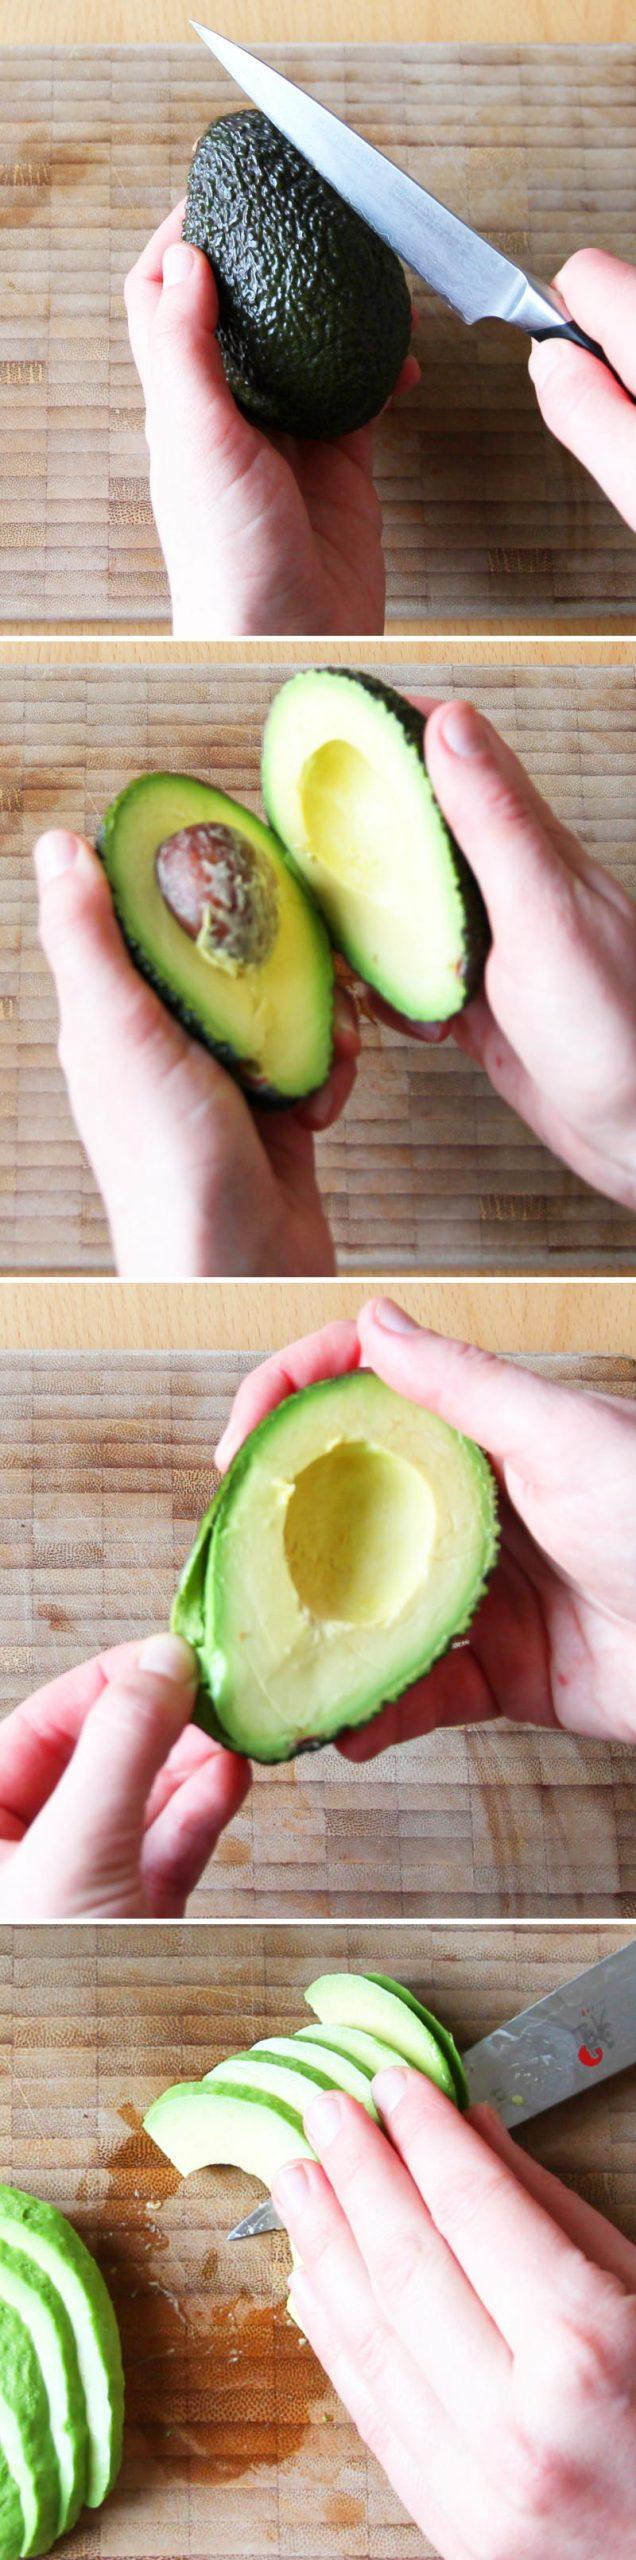 Futomaki Schritt 6 Avocado vorbereiten